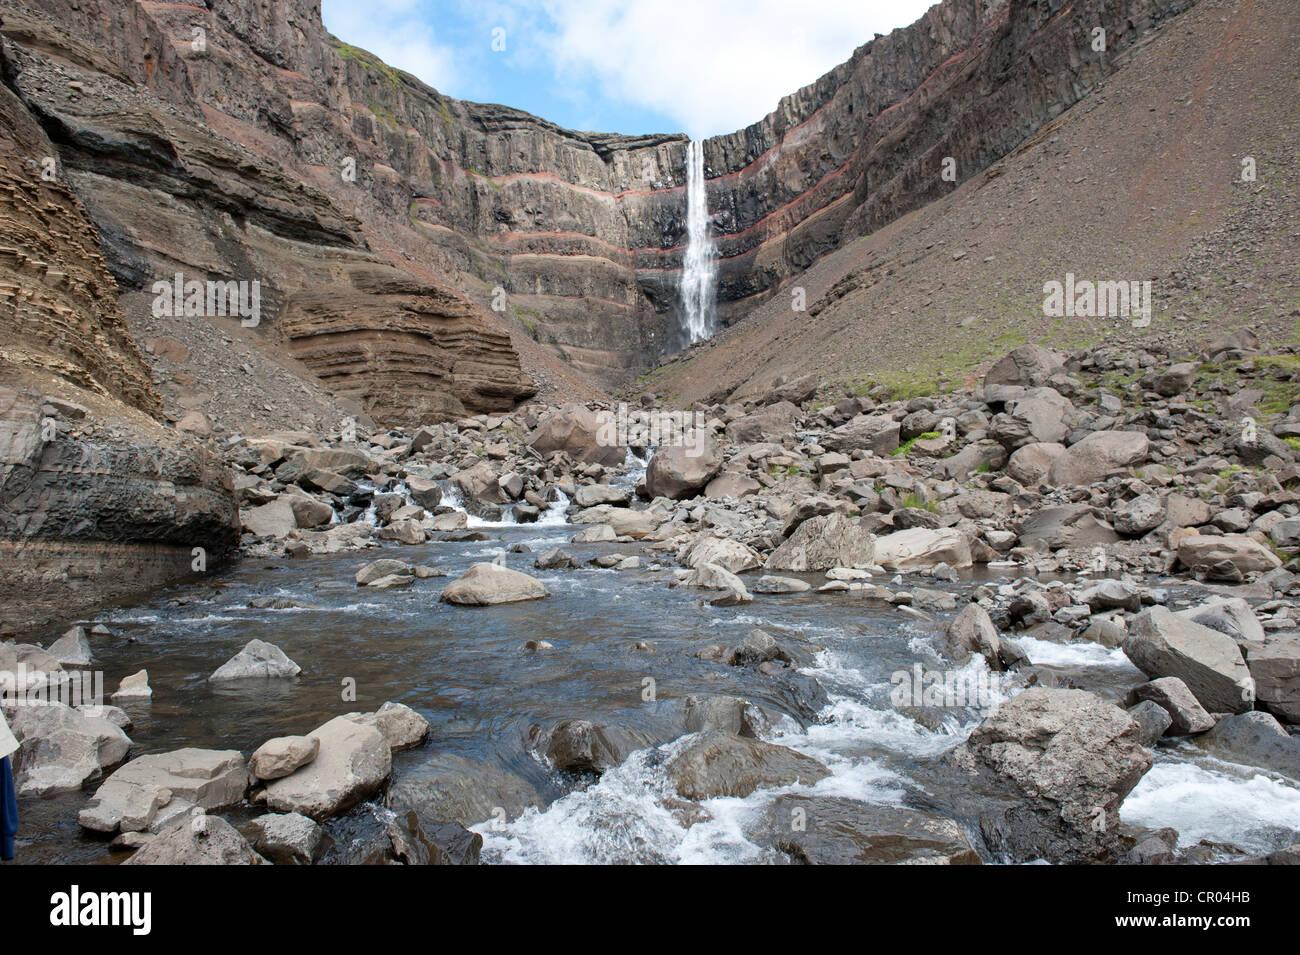 Zerklüftete Landschaft, Stream, Hengifoss Wasserfall in der Nähe von Egilsstaðir, Island, Skandinavien, Stockbild